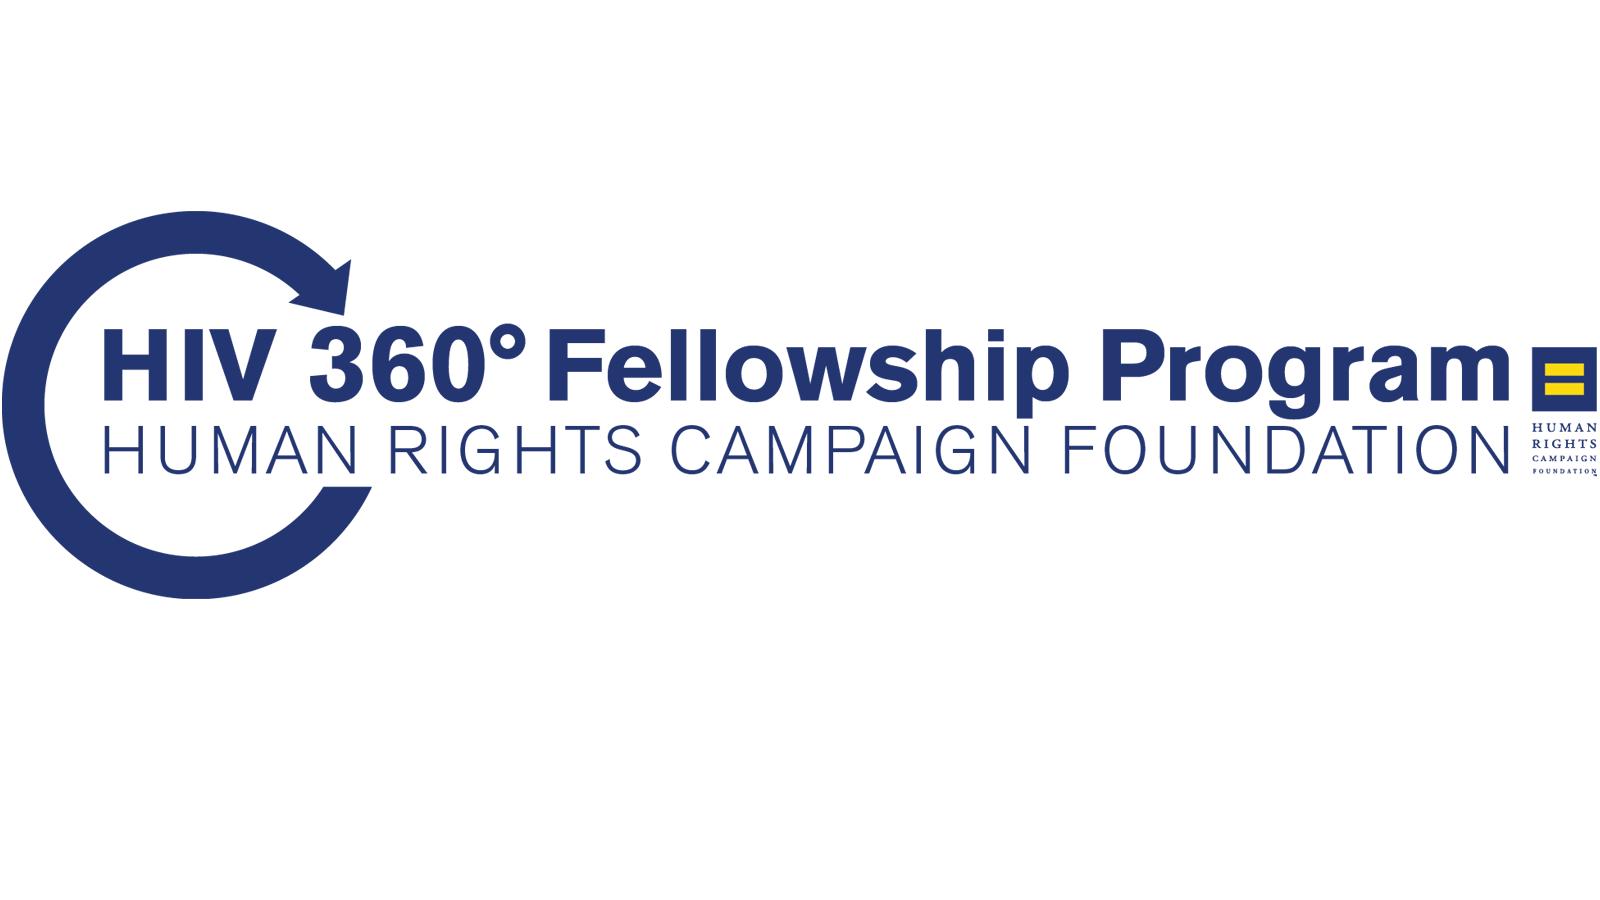 HIV 360 Fellowship Program